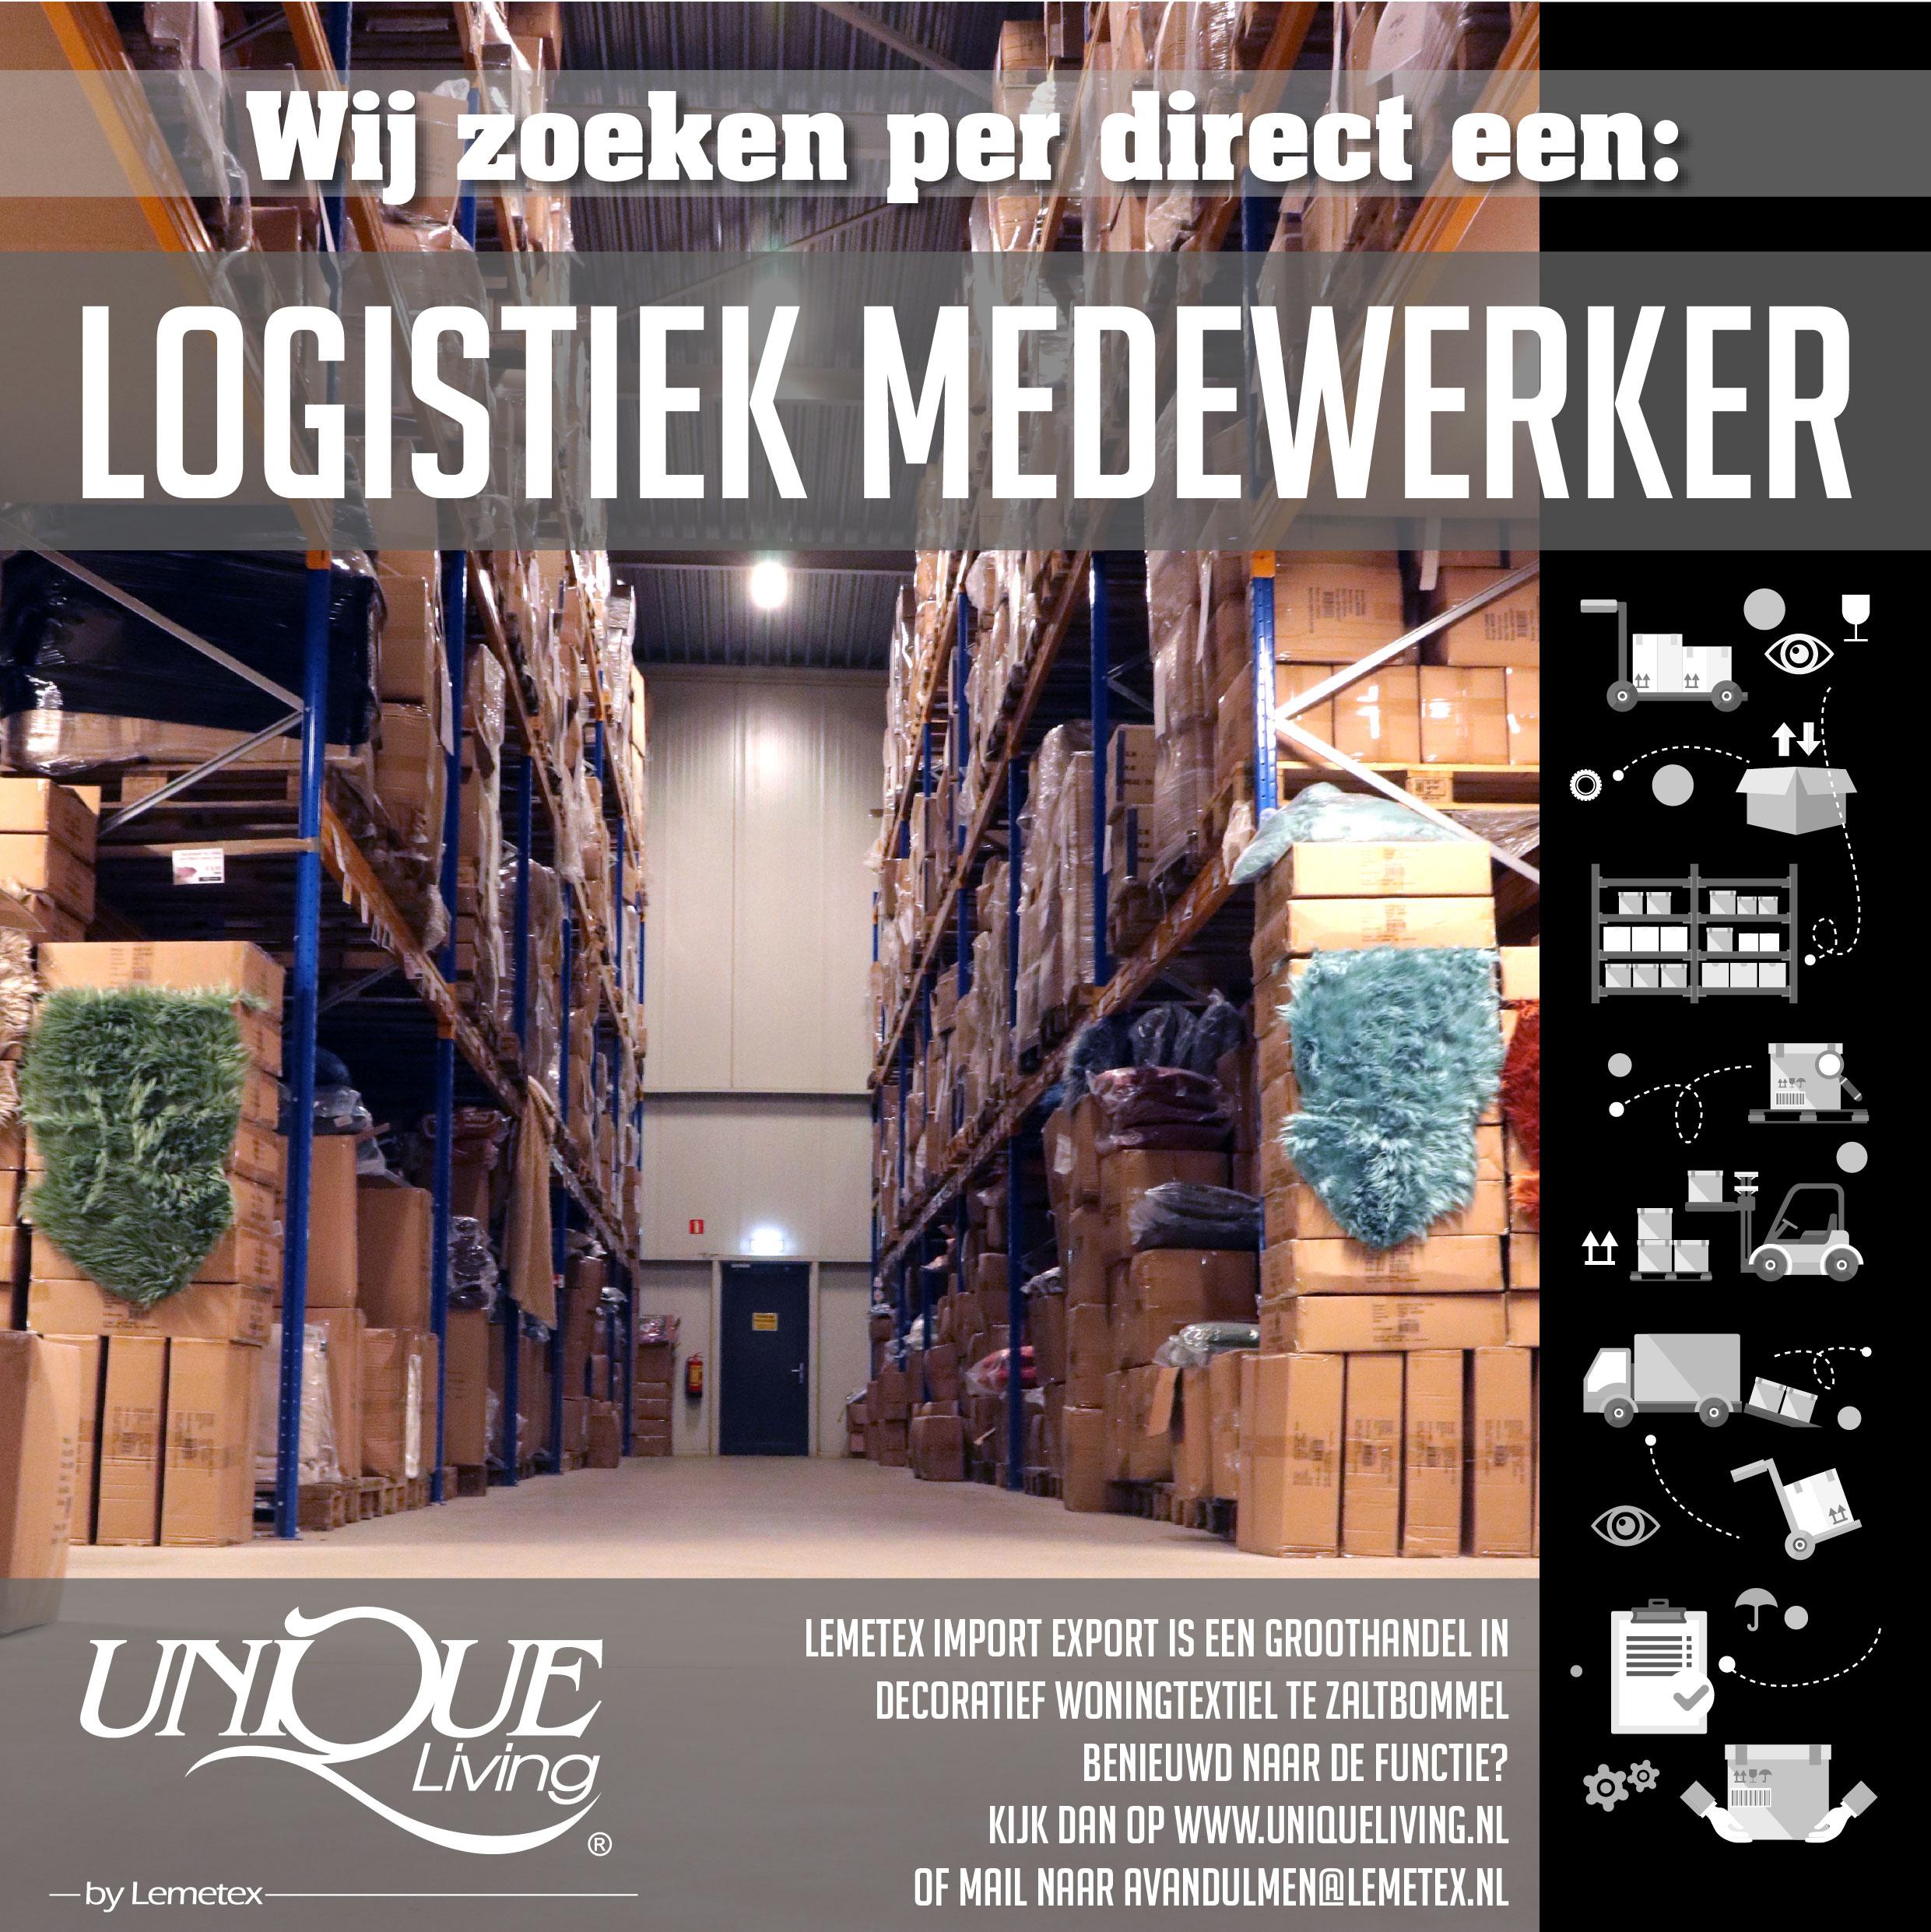 Unique Living vacature Logistiek Medewerker